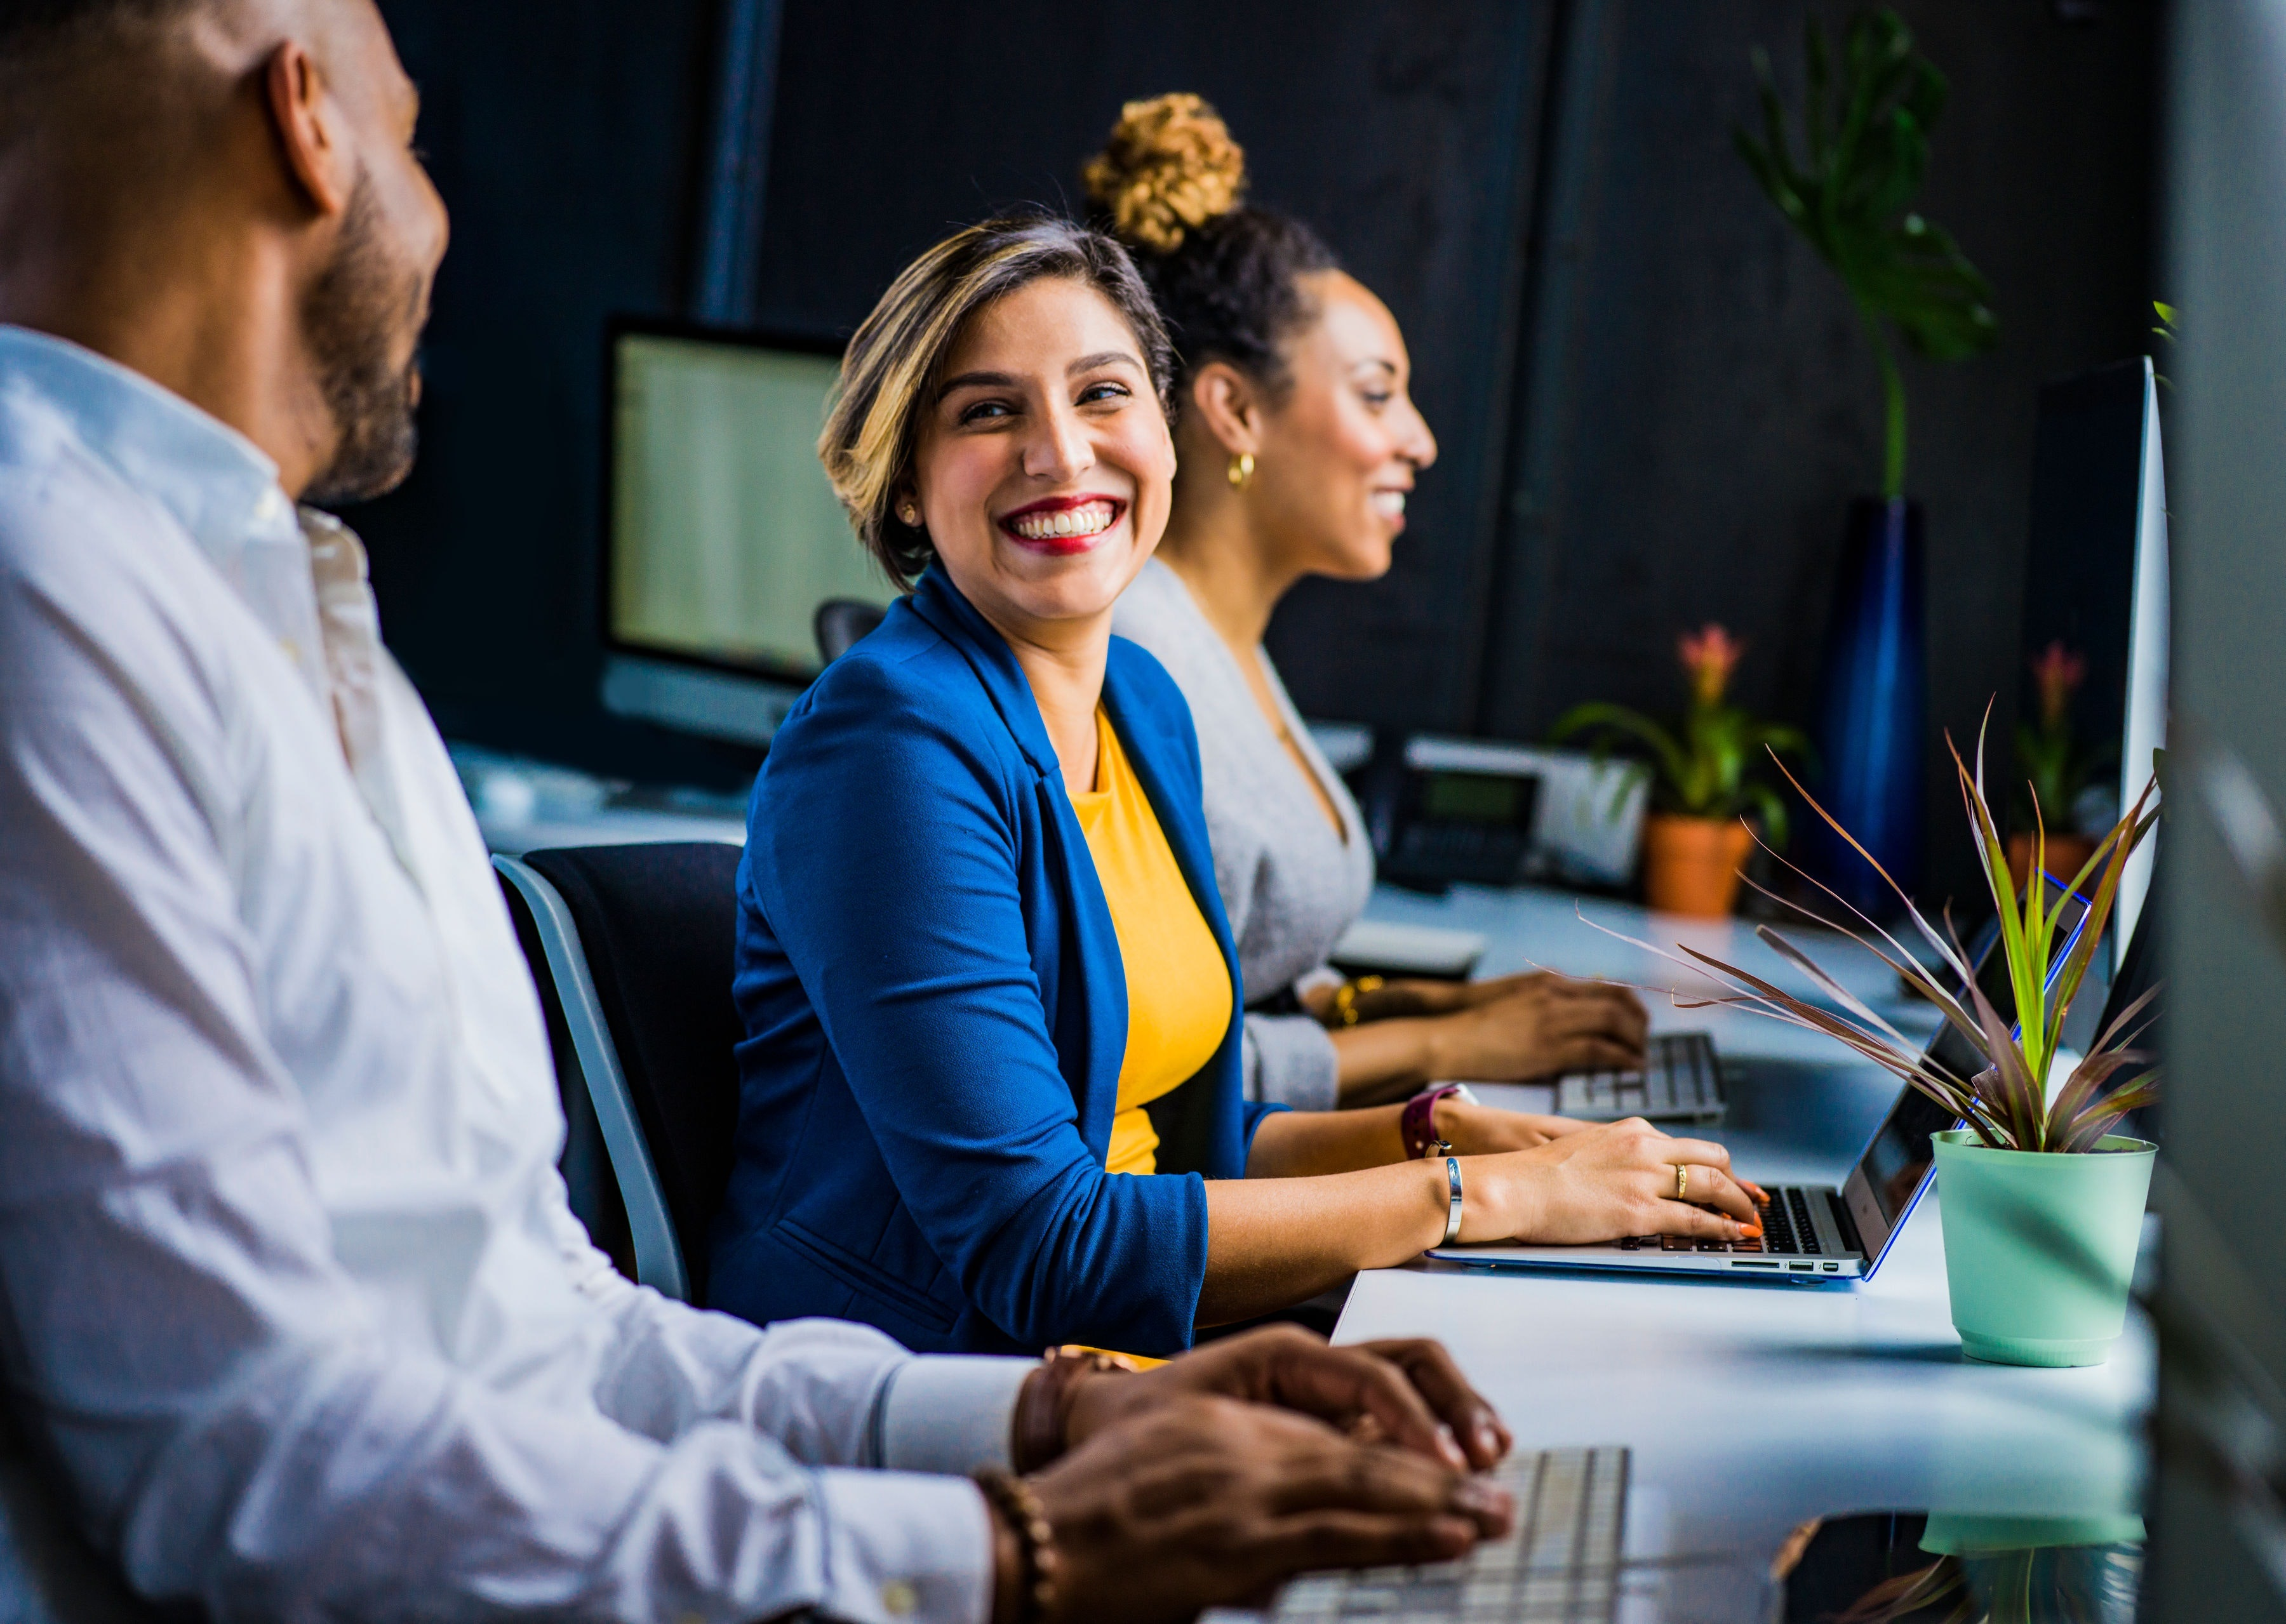 Employee Engagement = Retention + Leadership